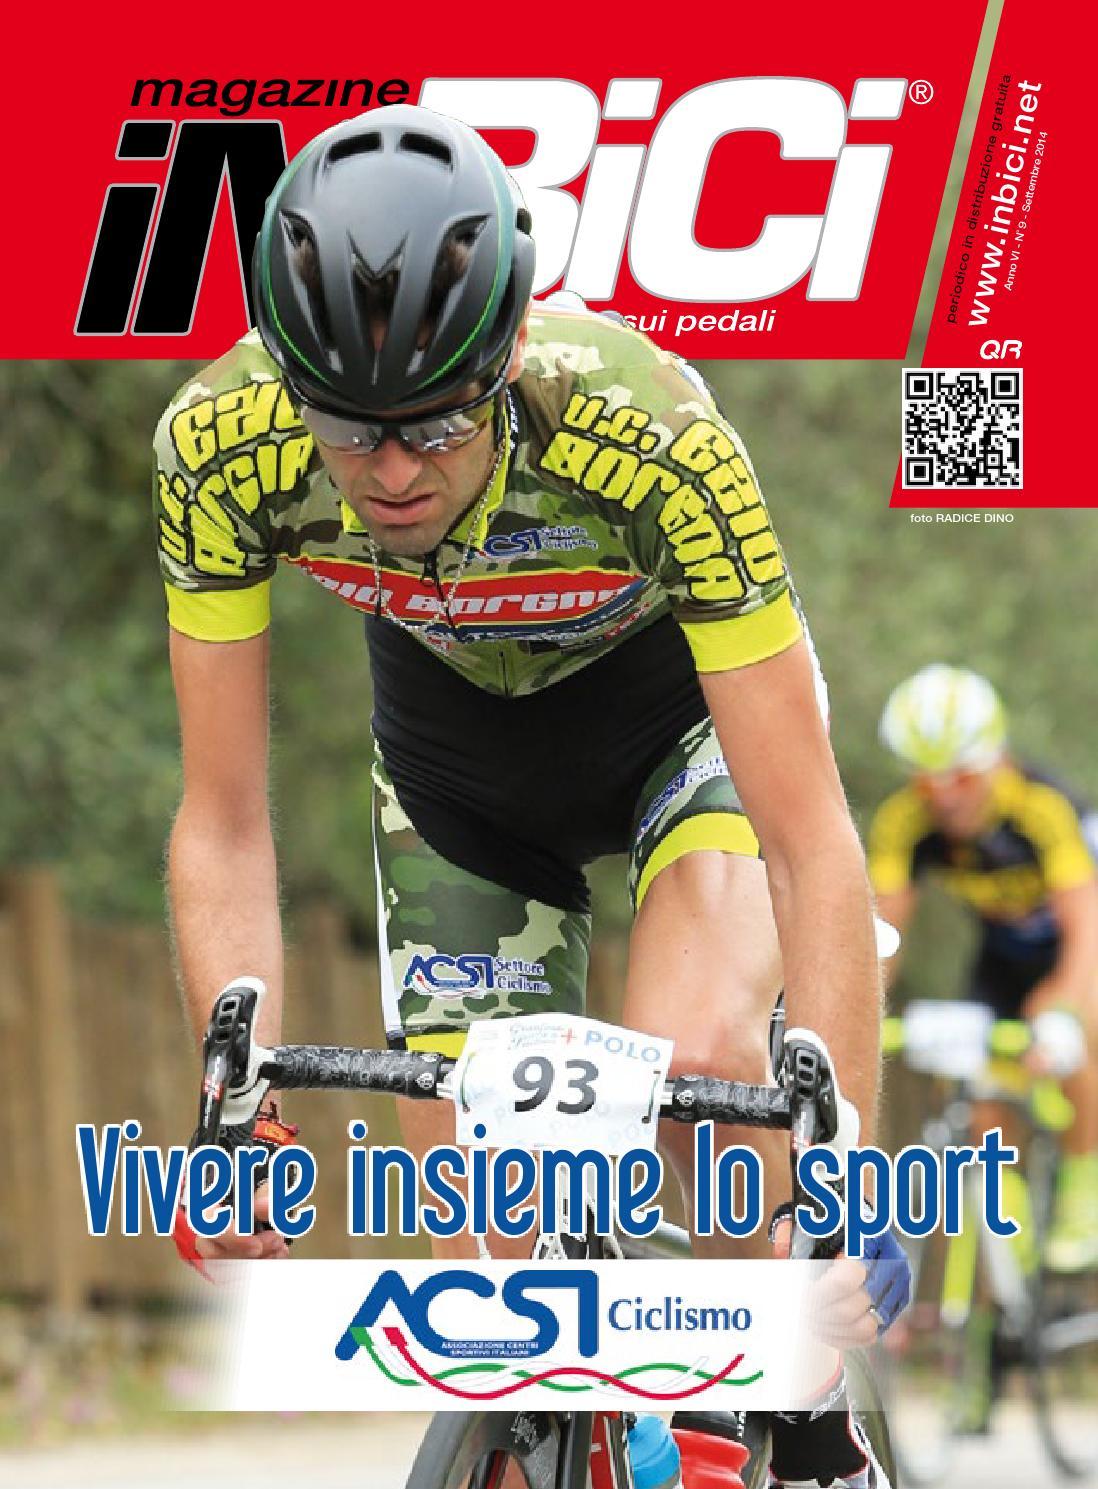 a8ad8f0be iNBiCi magazine anno 6- n9 Settembre 2014 by iNBiCi Magazine - issuu